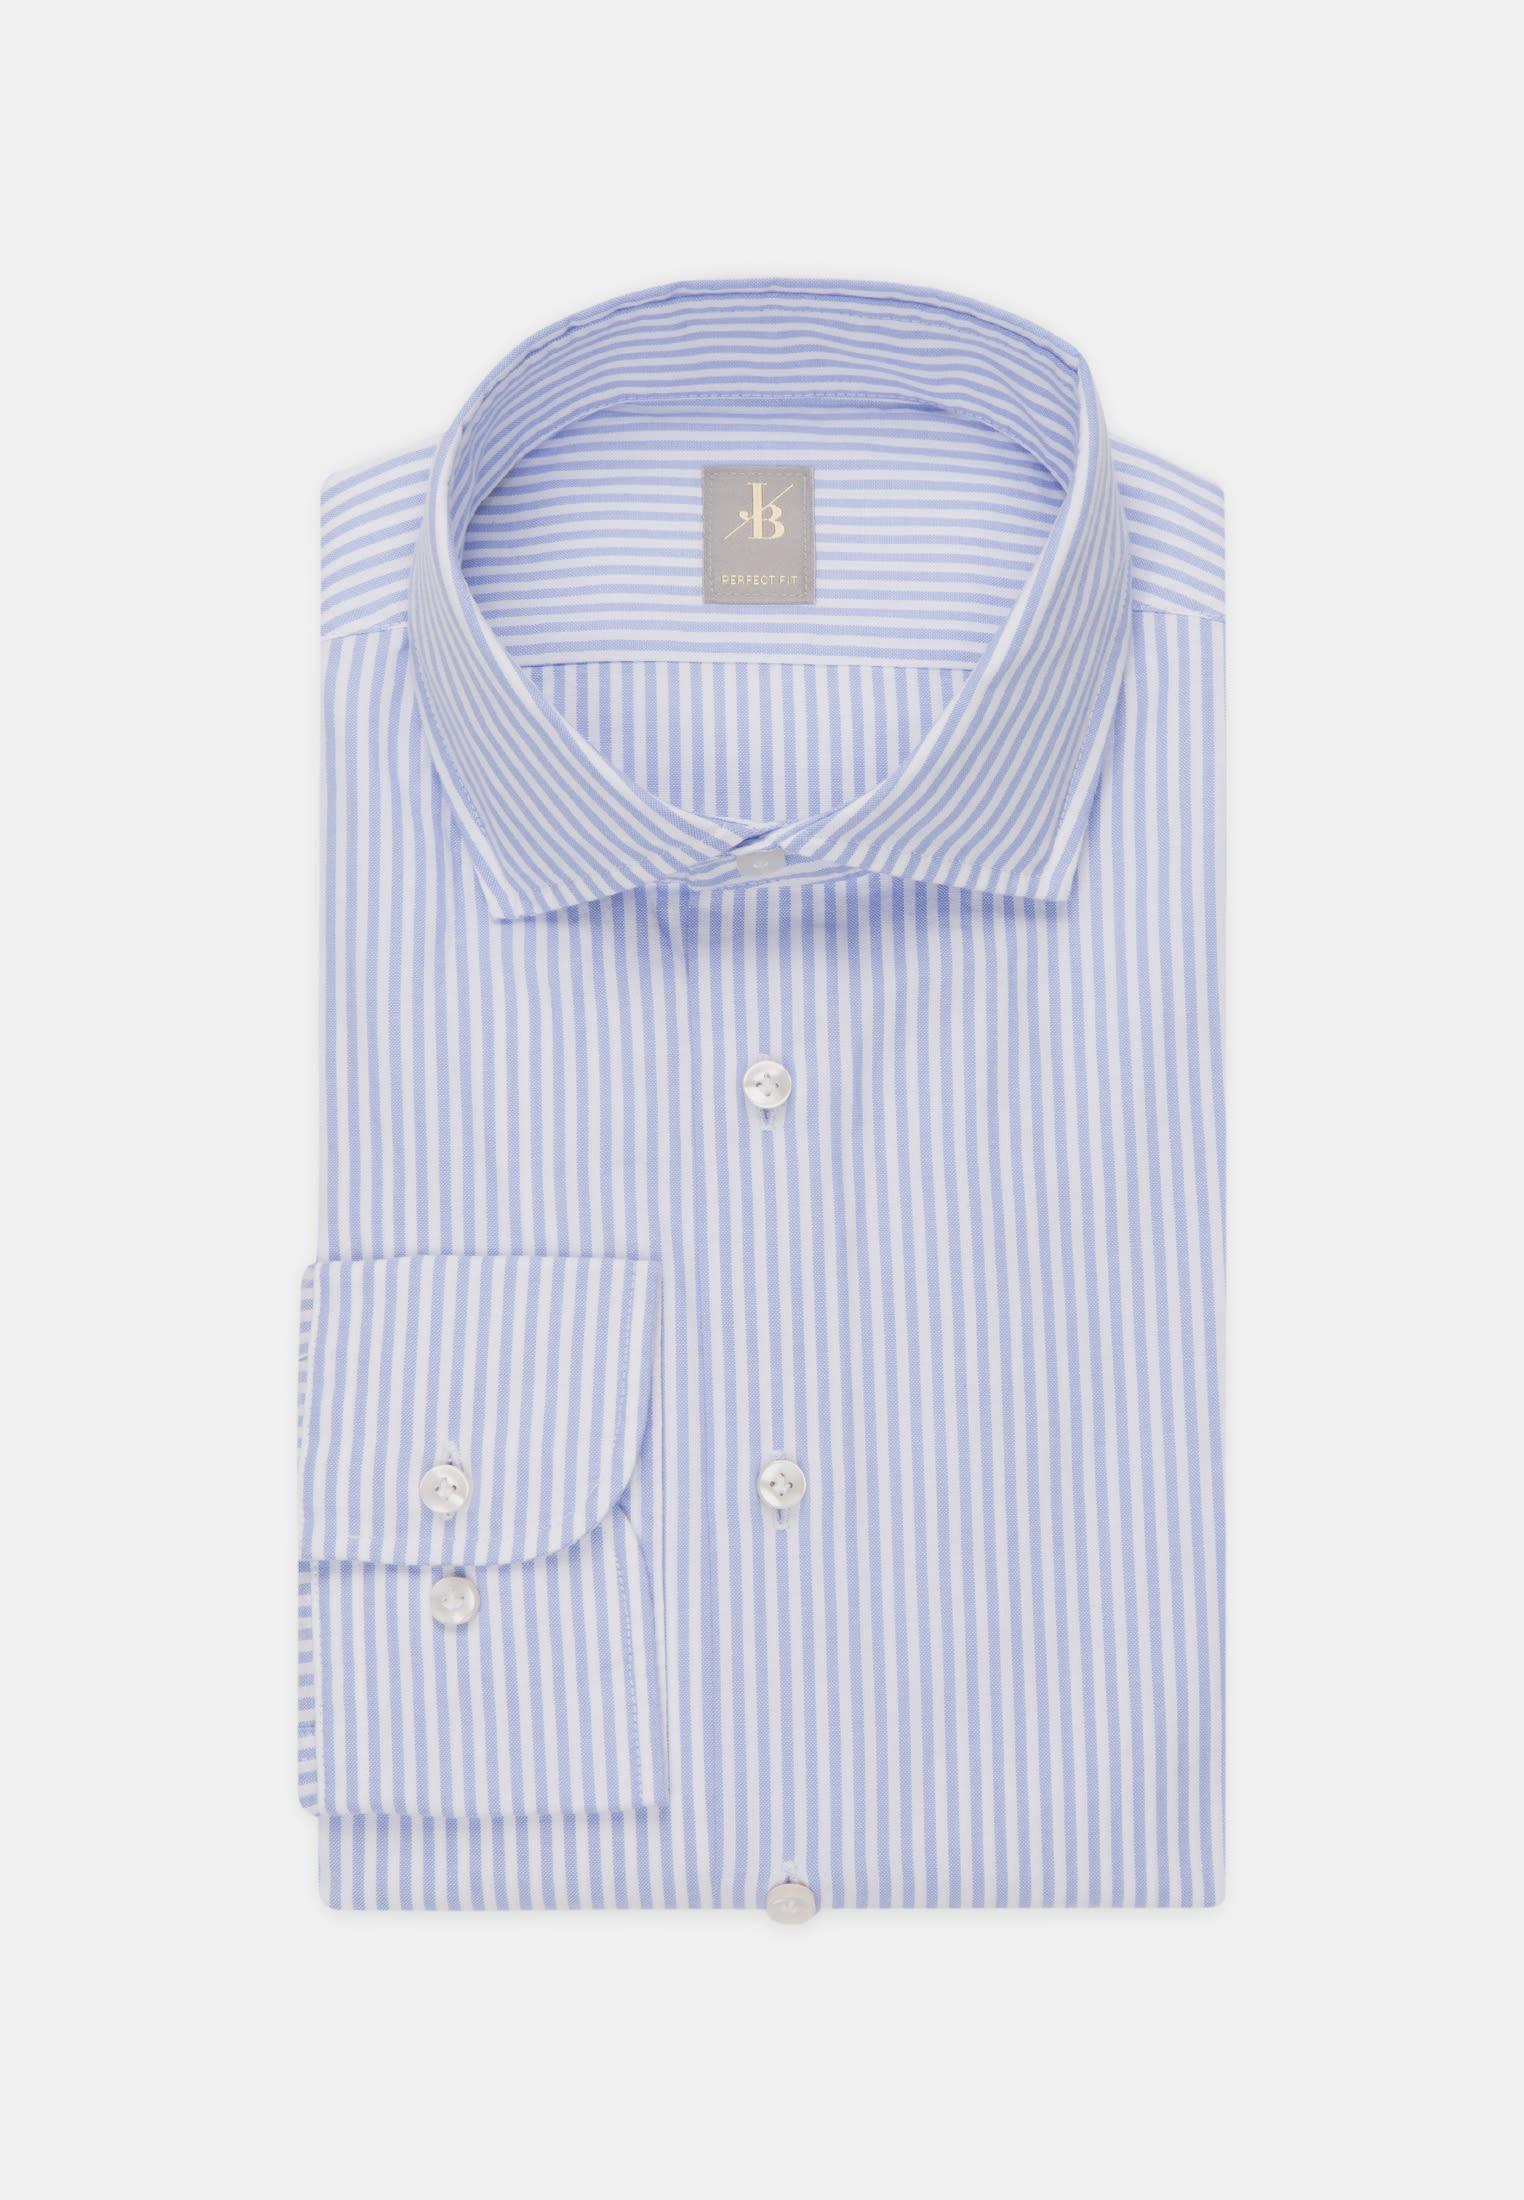 Oxford Smart Casual Hemd in Perfect Fit mit Haifischkragen in Mittelblau    Jacques Britt Onlineshop